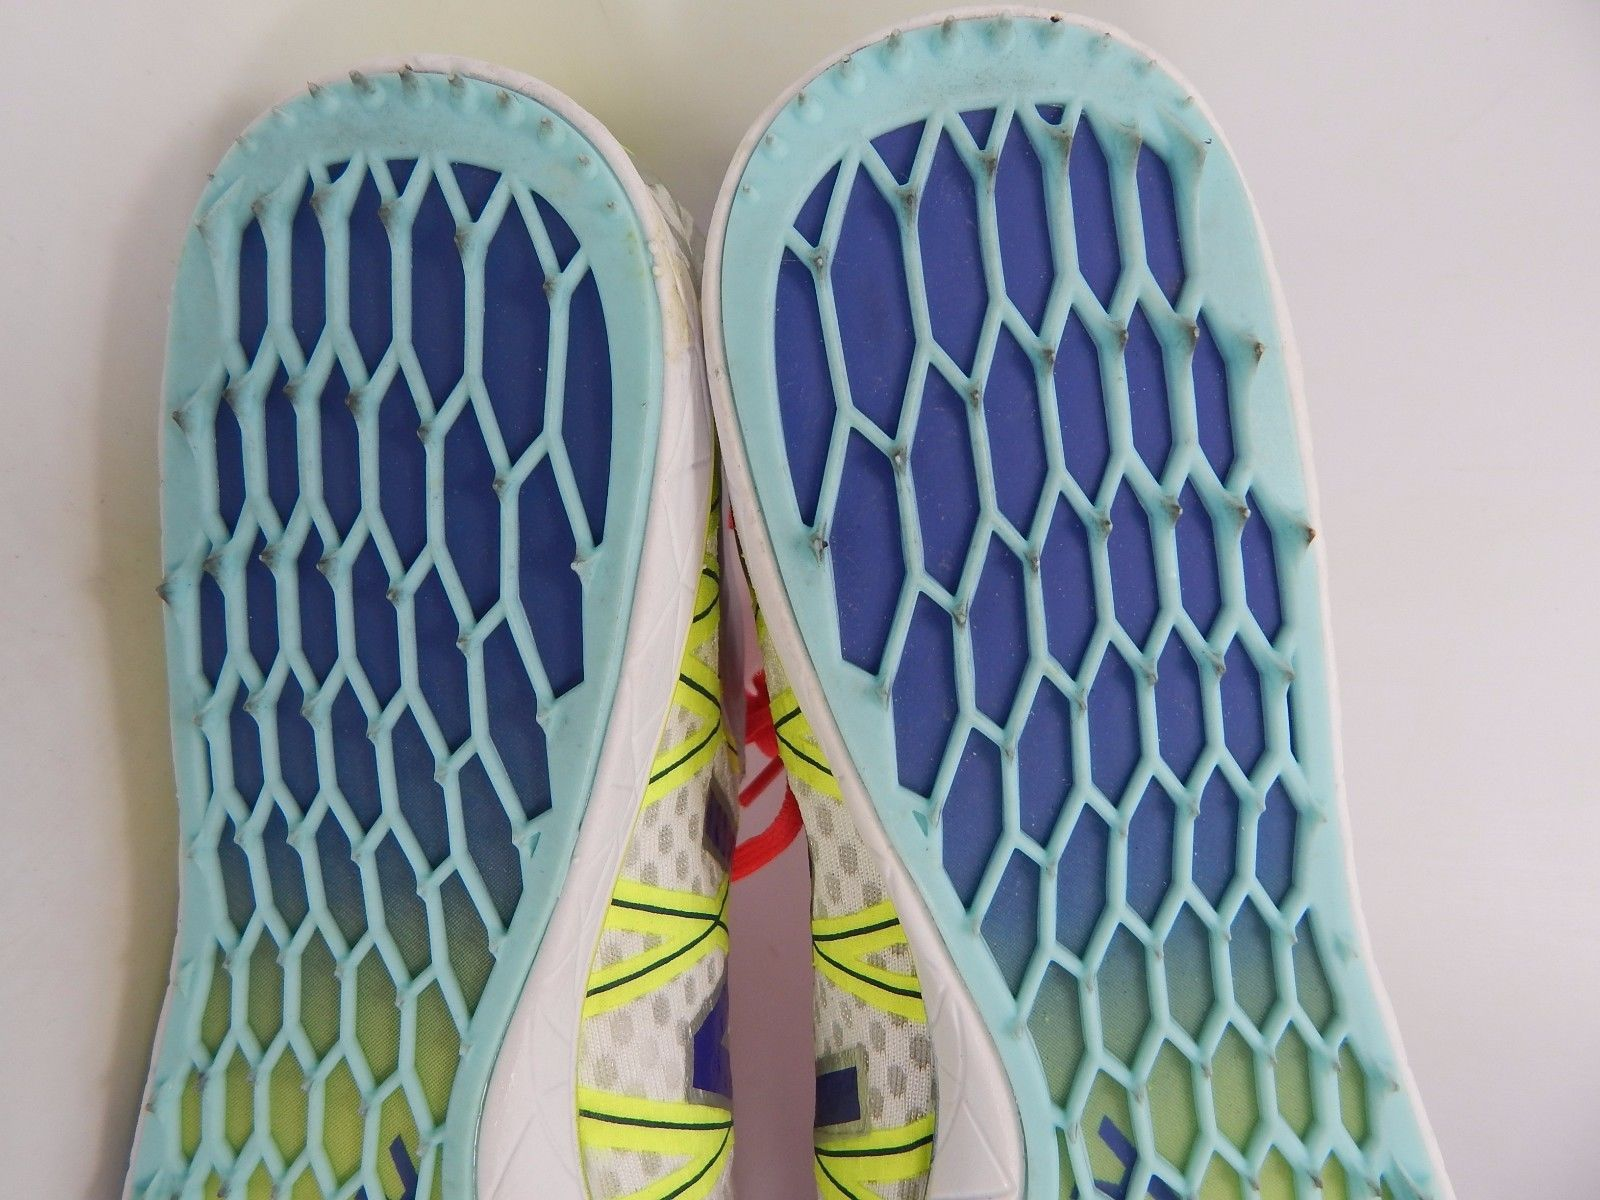 New Balance LD 5000 Women's Track Running Shoes Size US 9.5 M (B) EU 41 WLD5000S